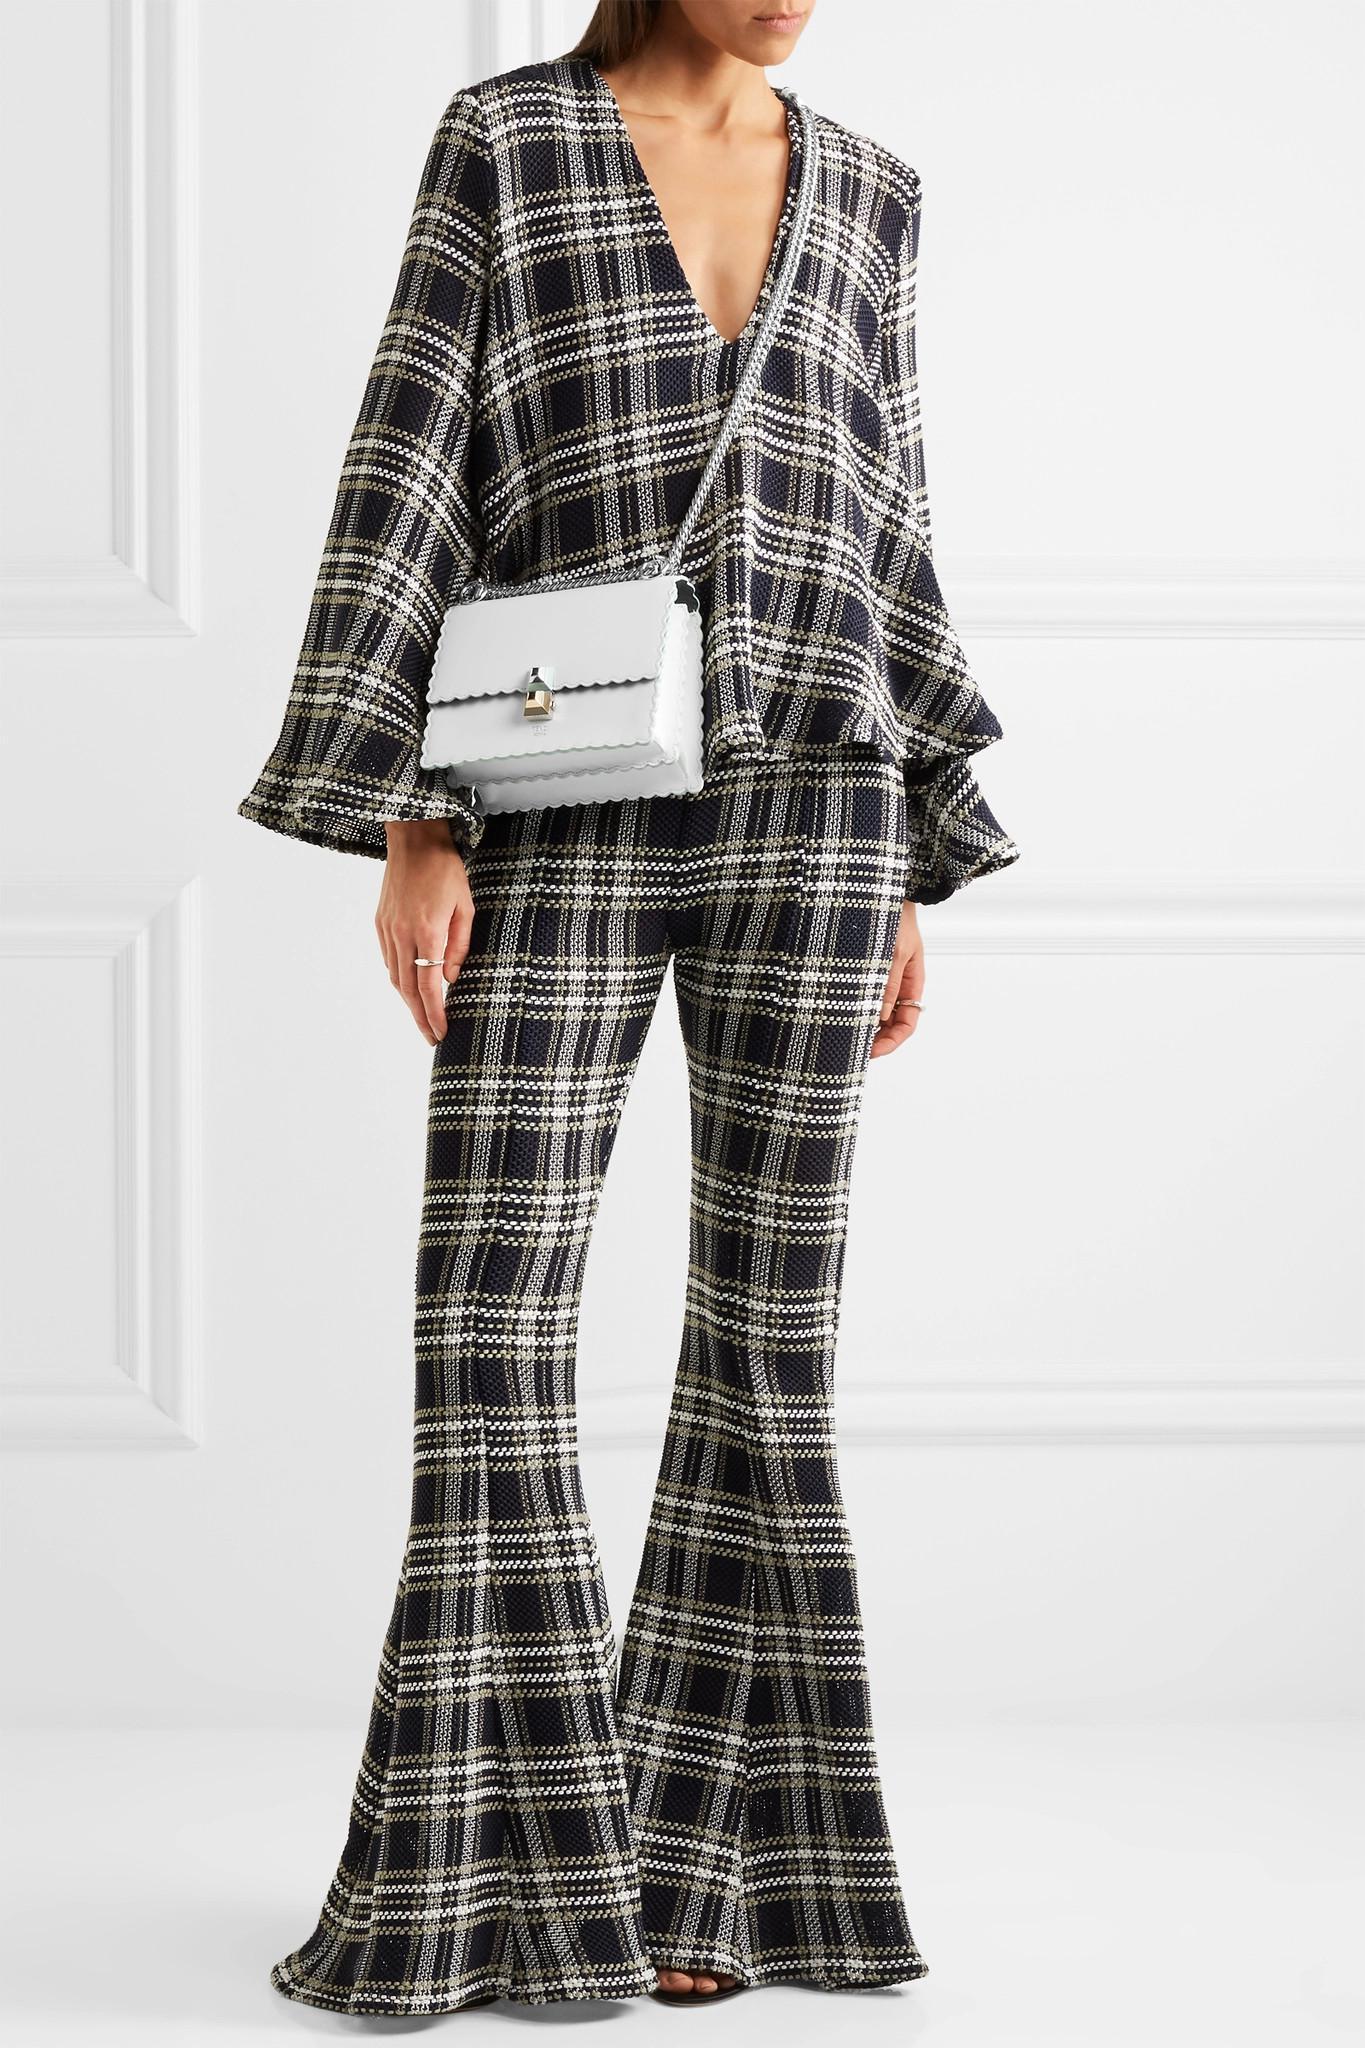 a97dc386a82e Lyst - Fendi Kan I Mini Leather Shoulder Bag in White